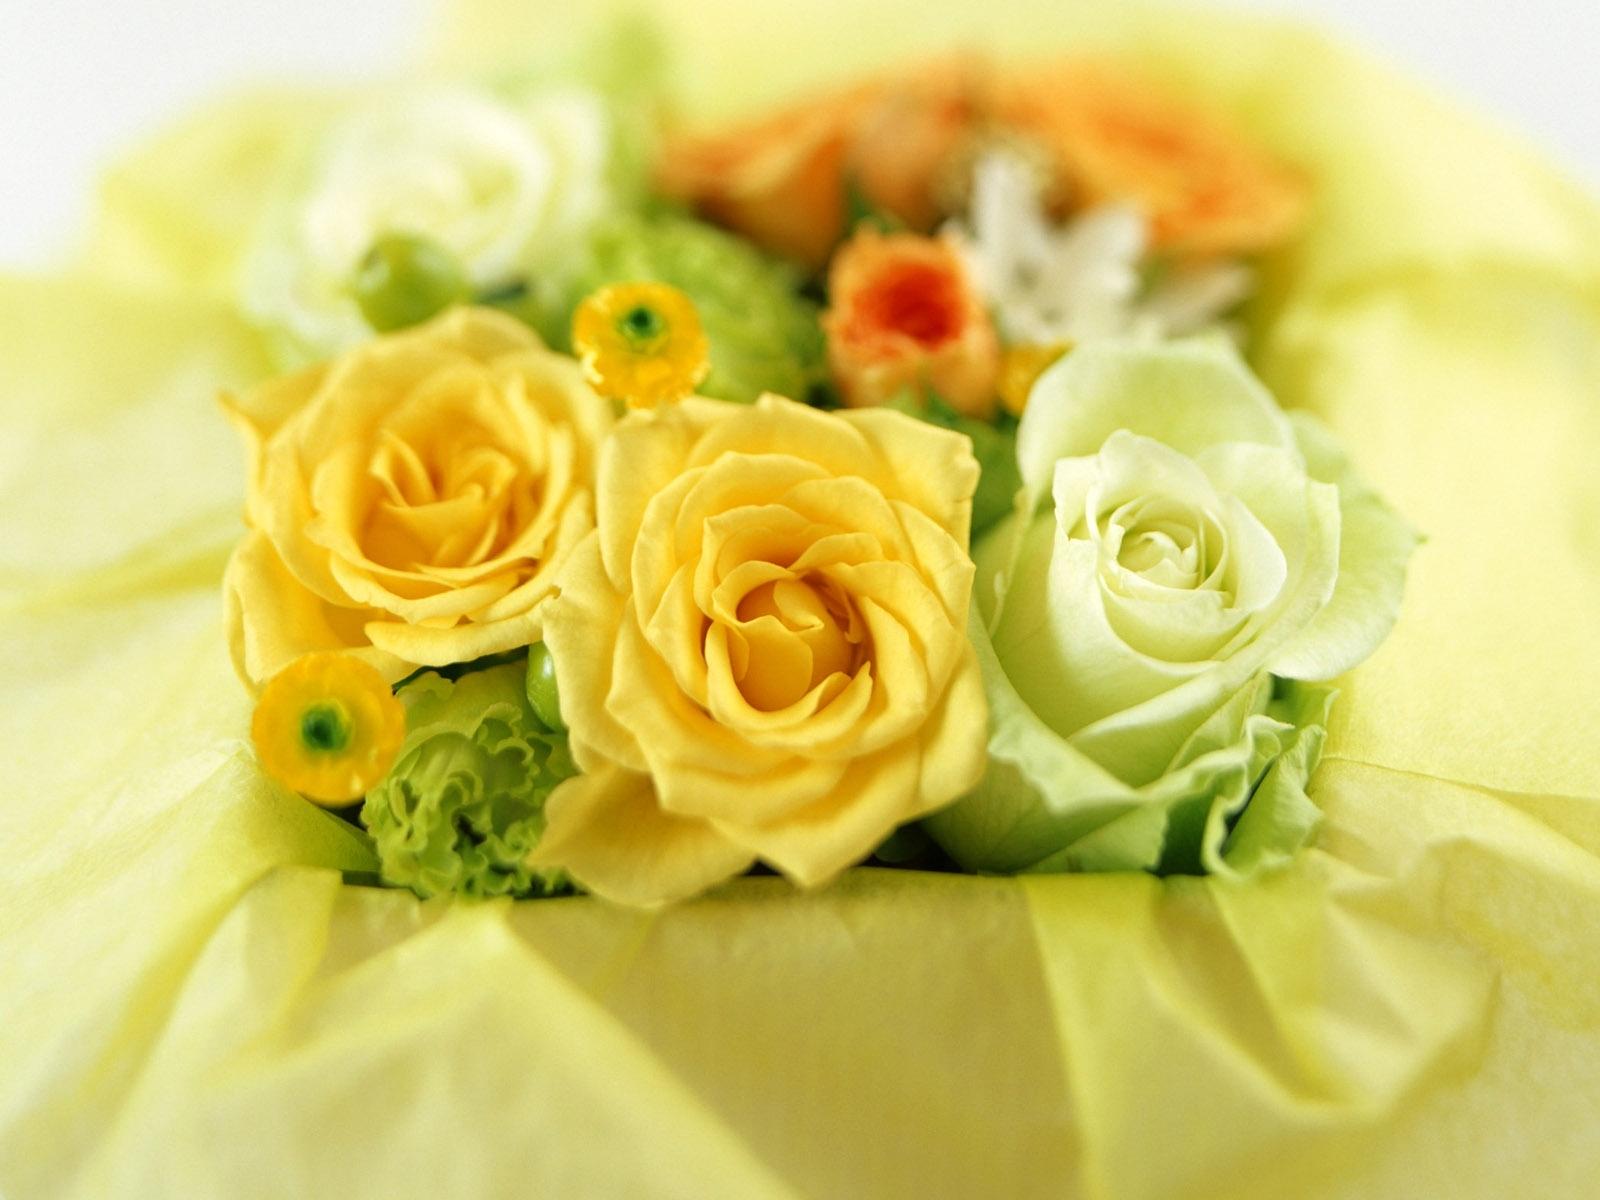 открытки с желтыми цветами дрель балеринку